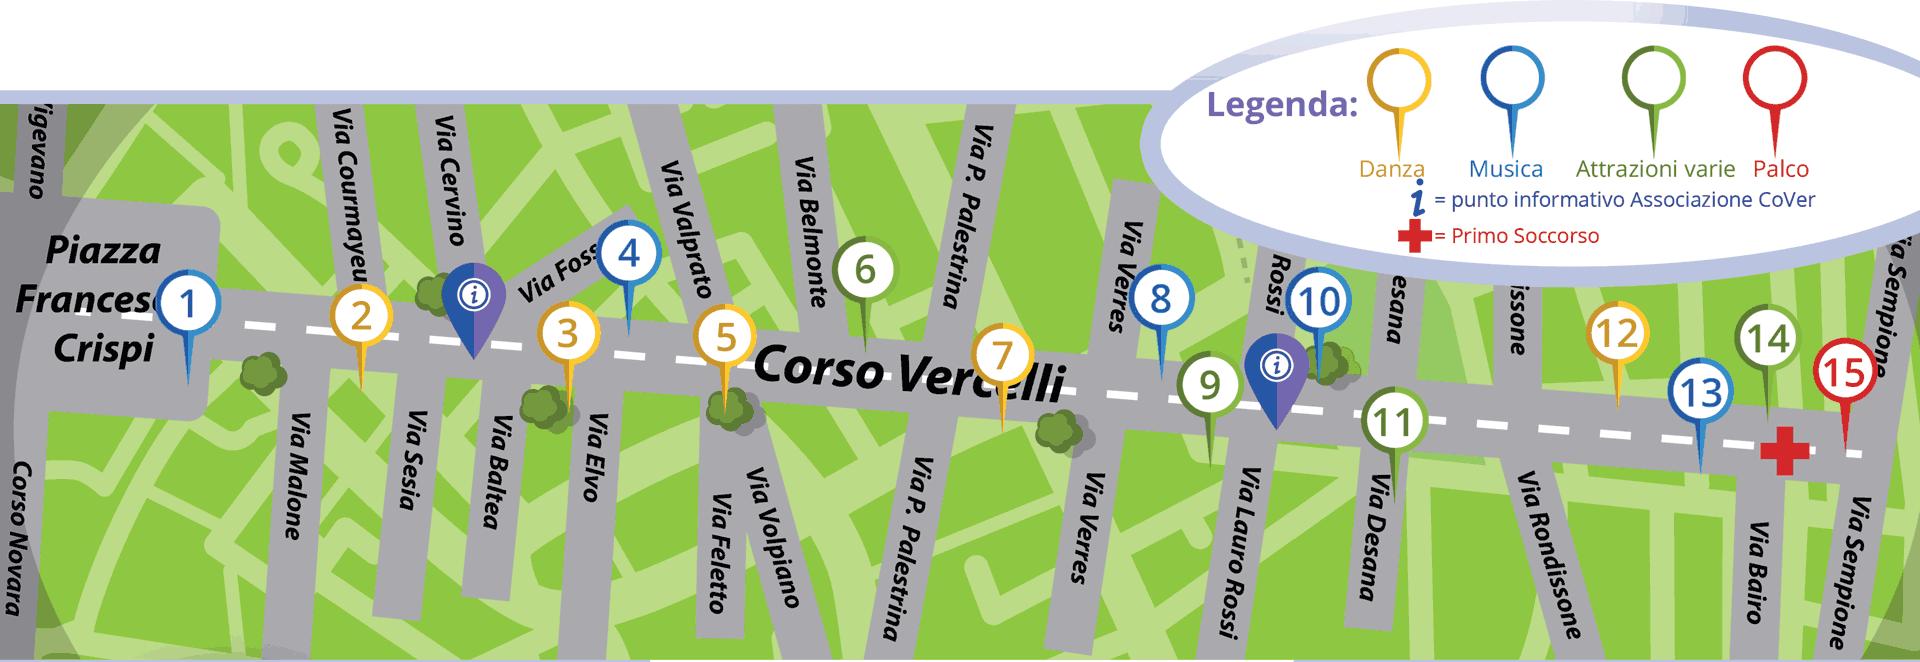 mappa eventi Street Music Fest